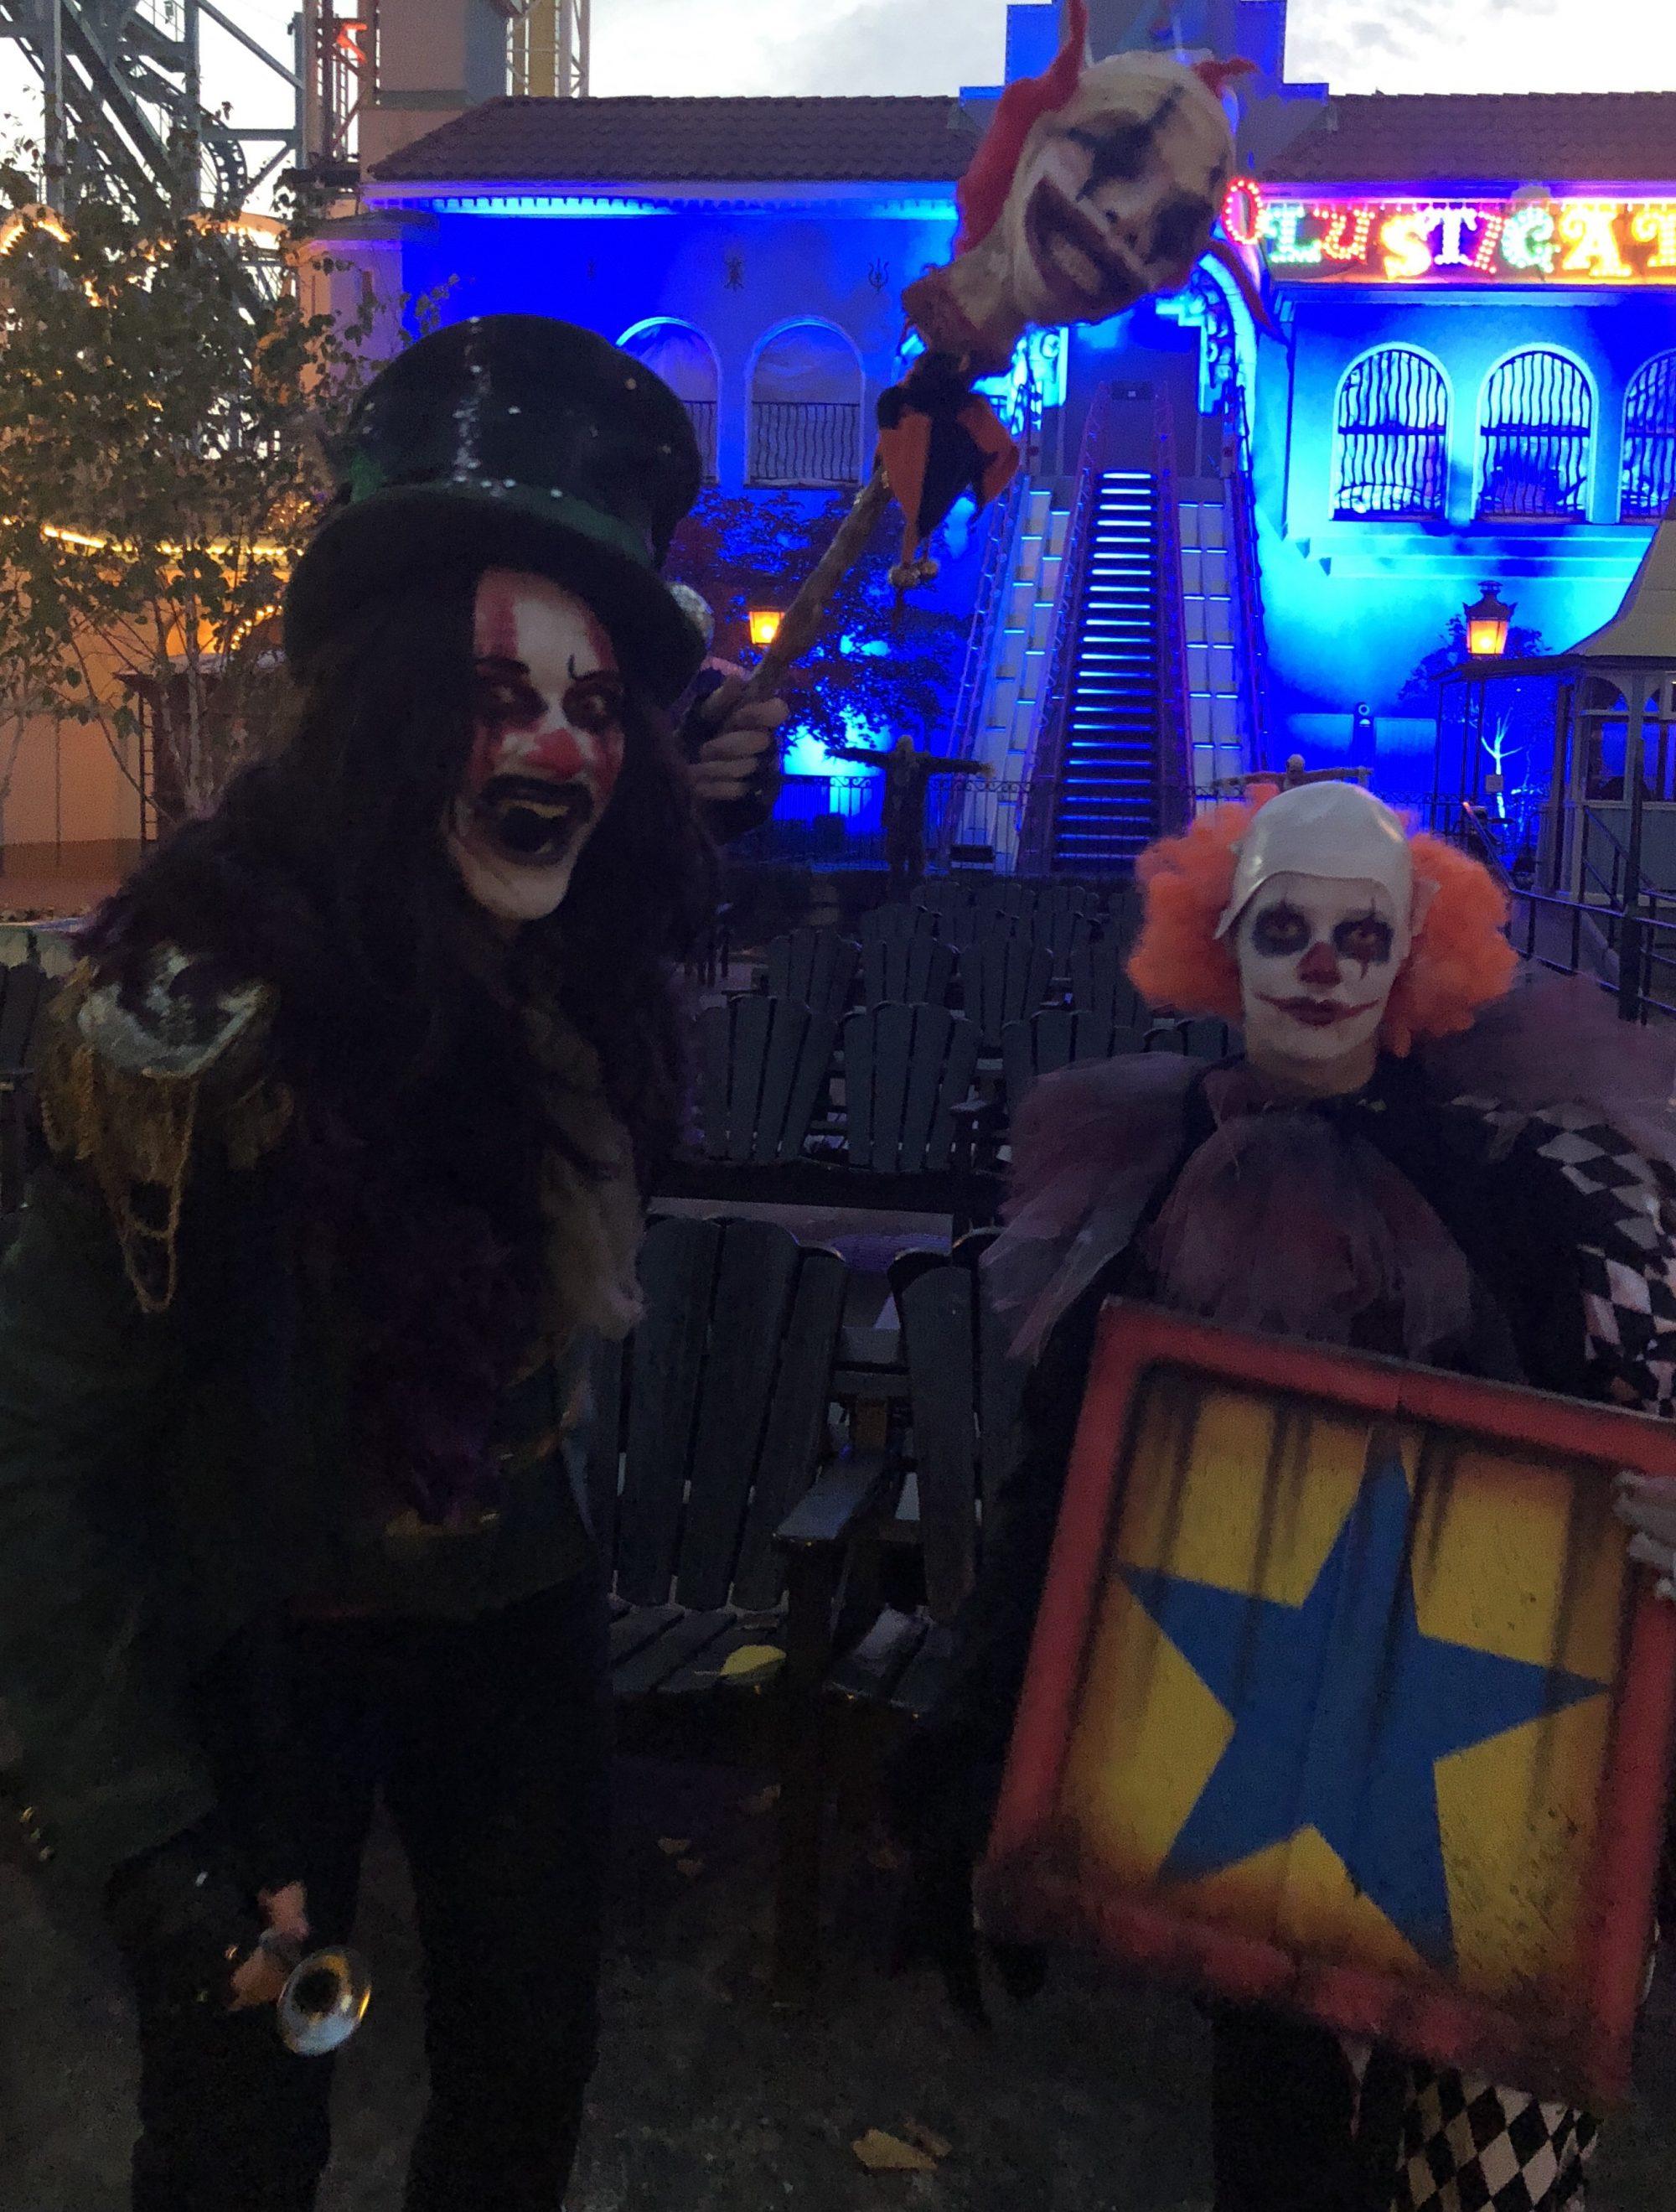 Halloween på Gröna Lund - nyheter 2018